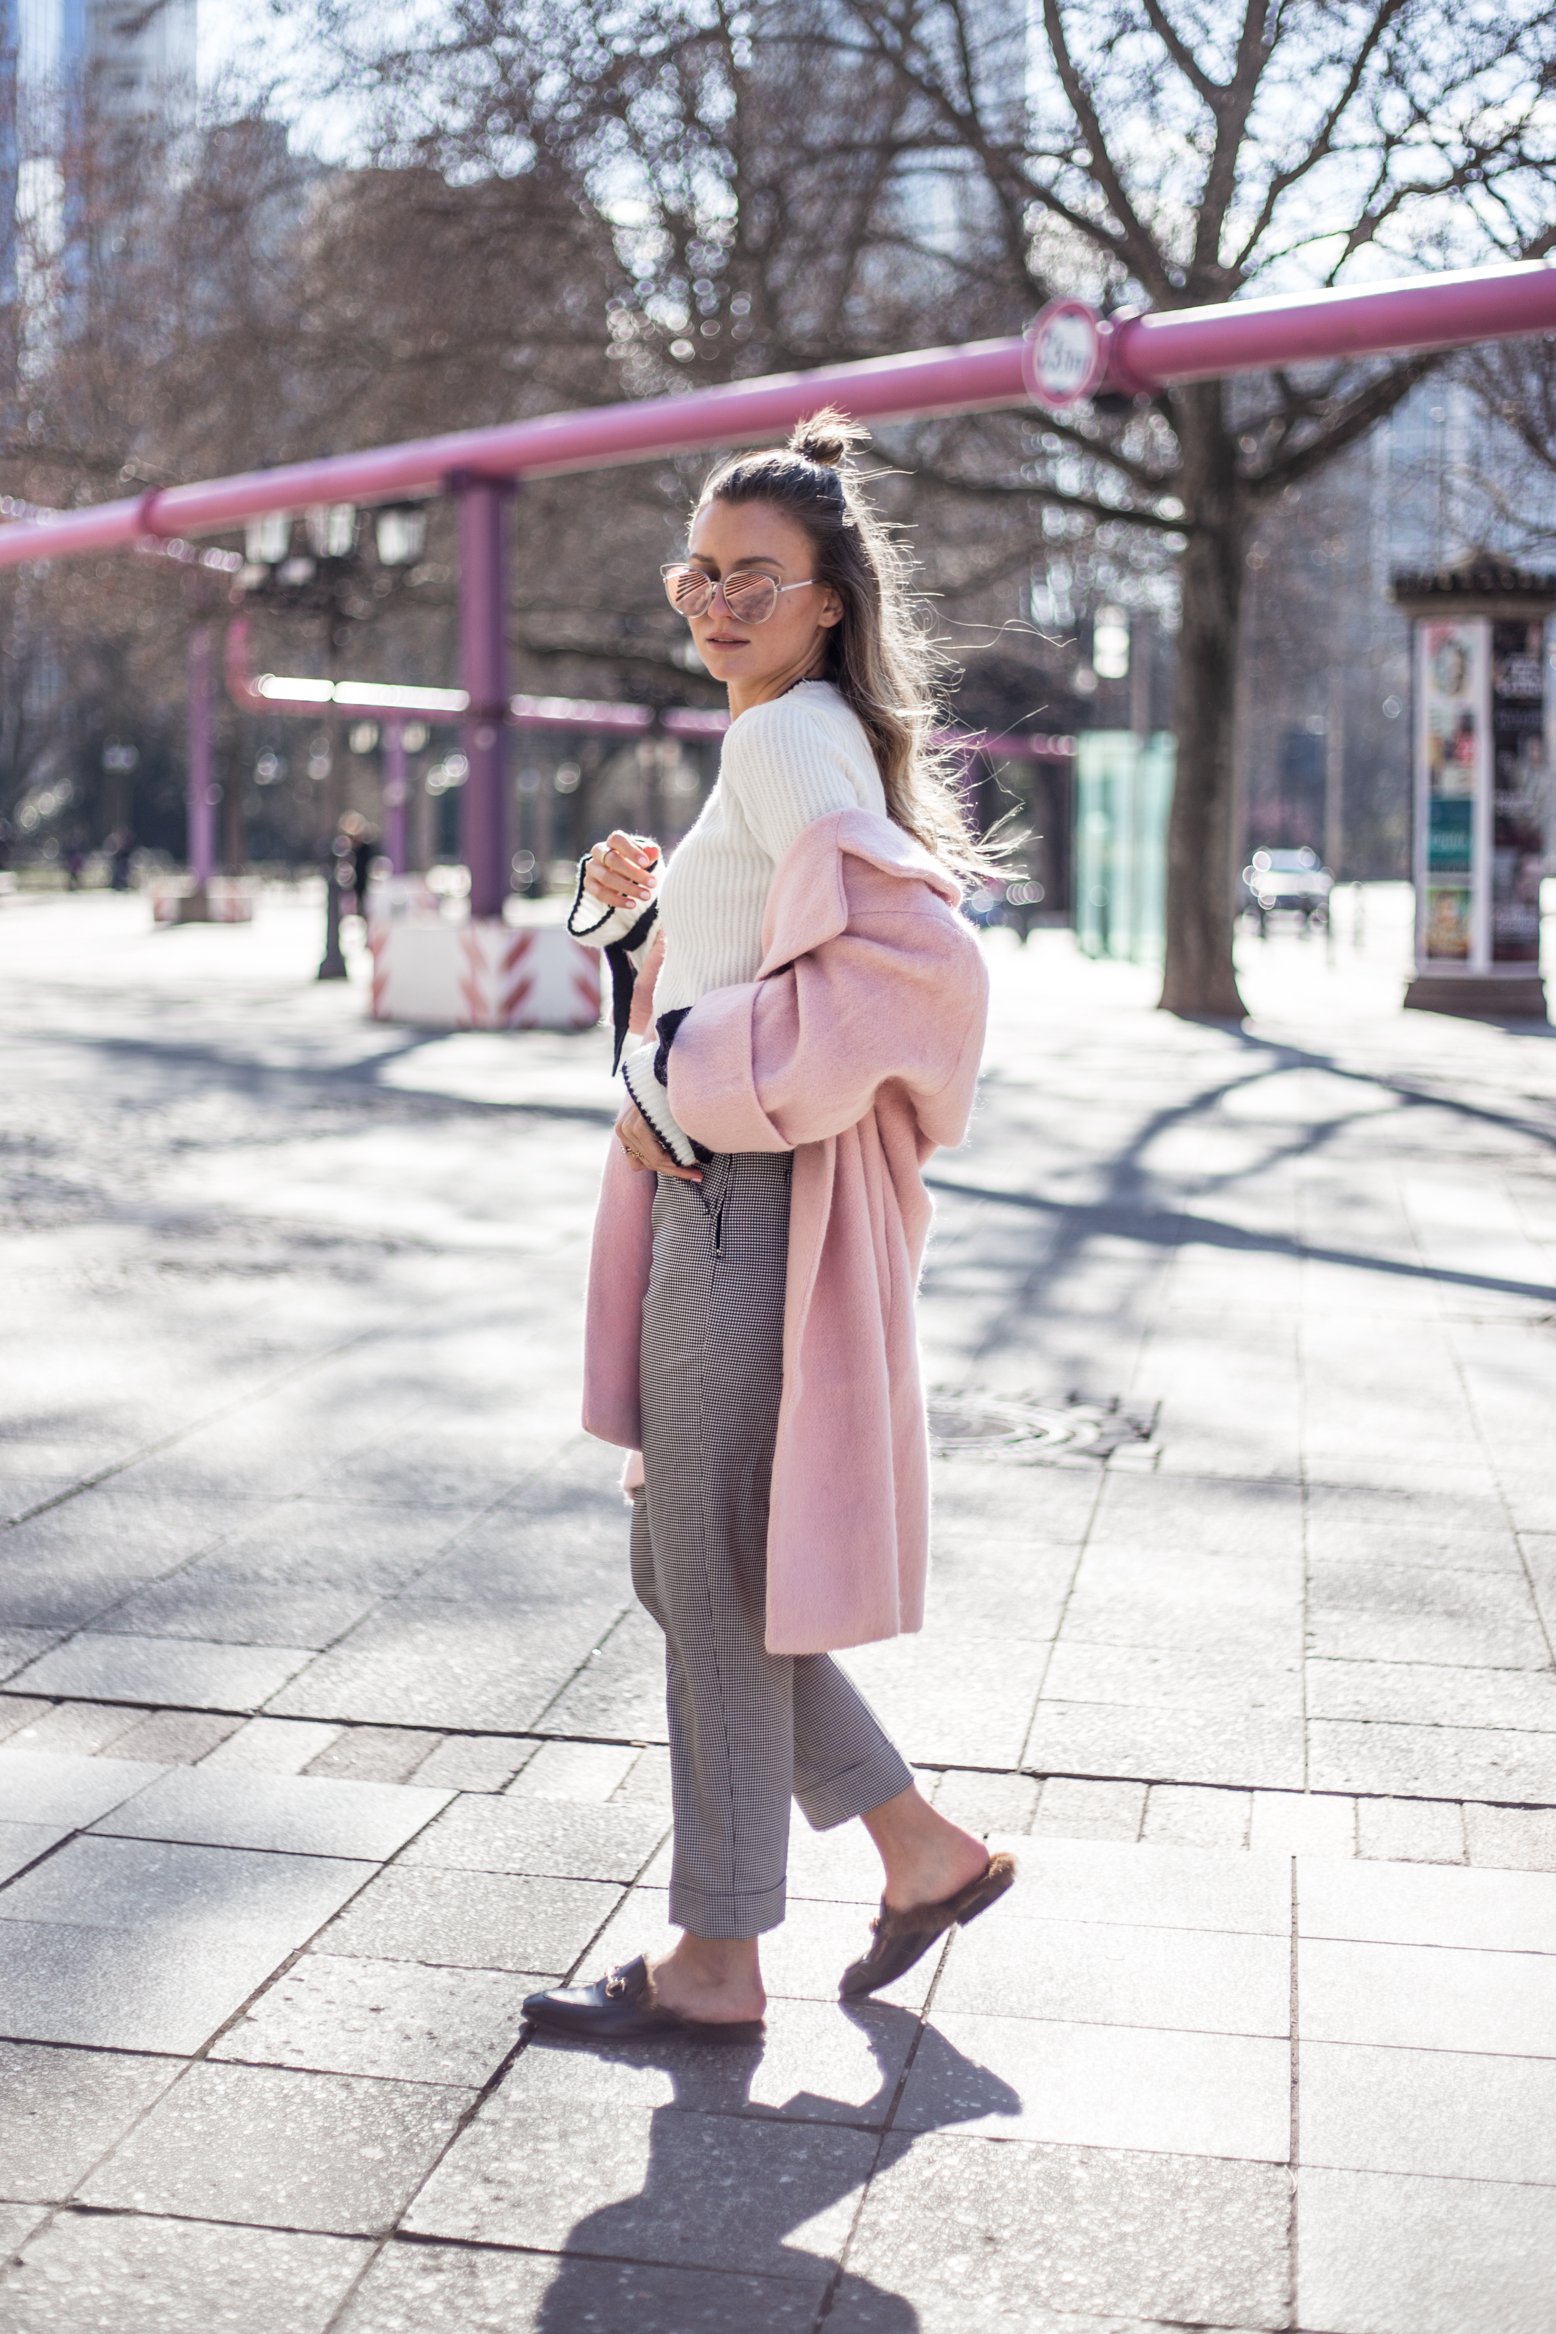 pink-coat-gucci-slipper-livia-auer-1680